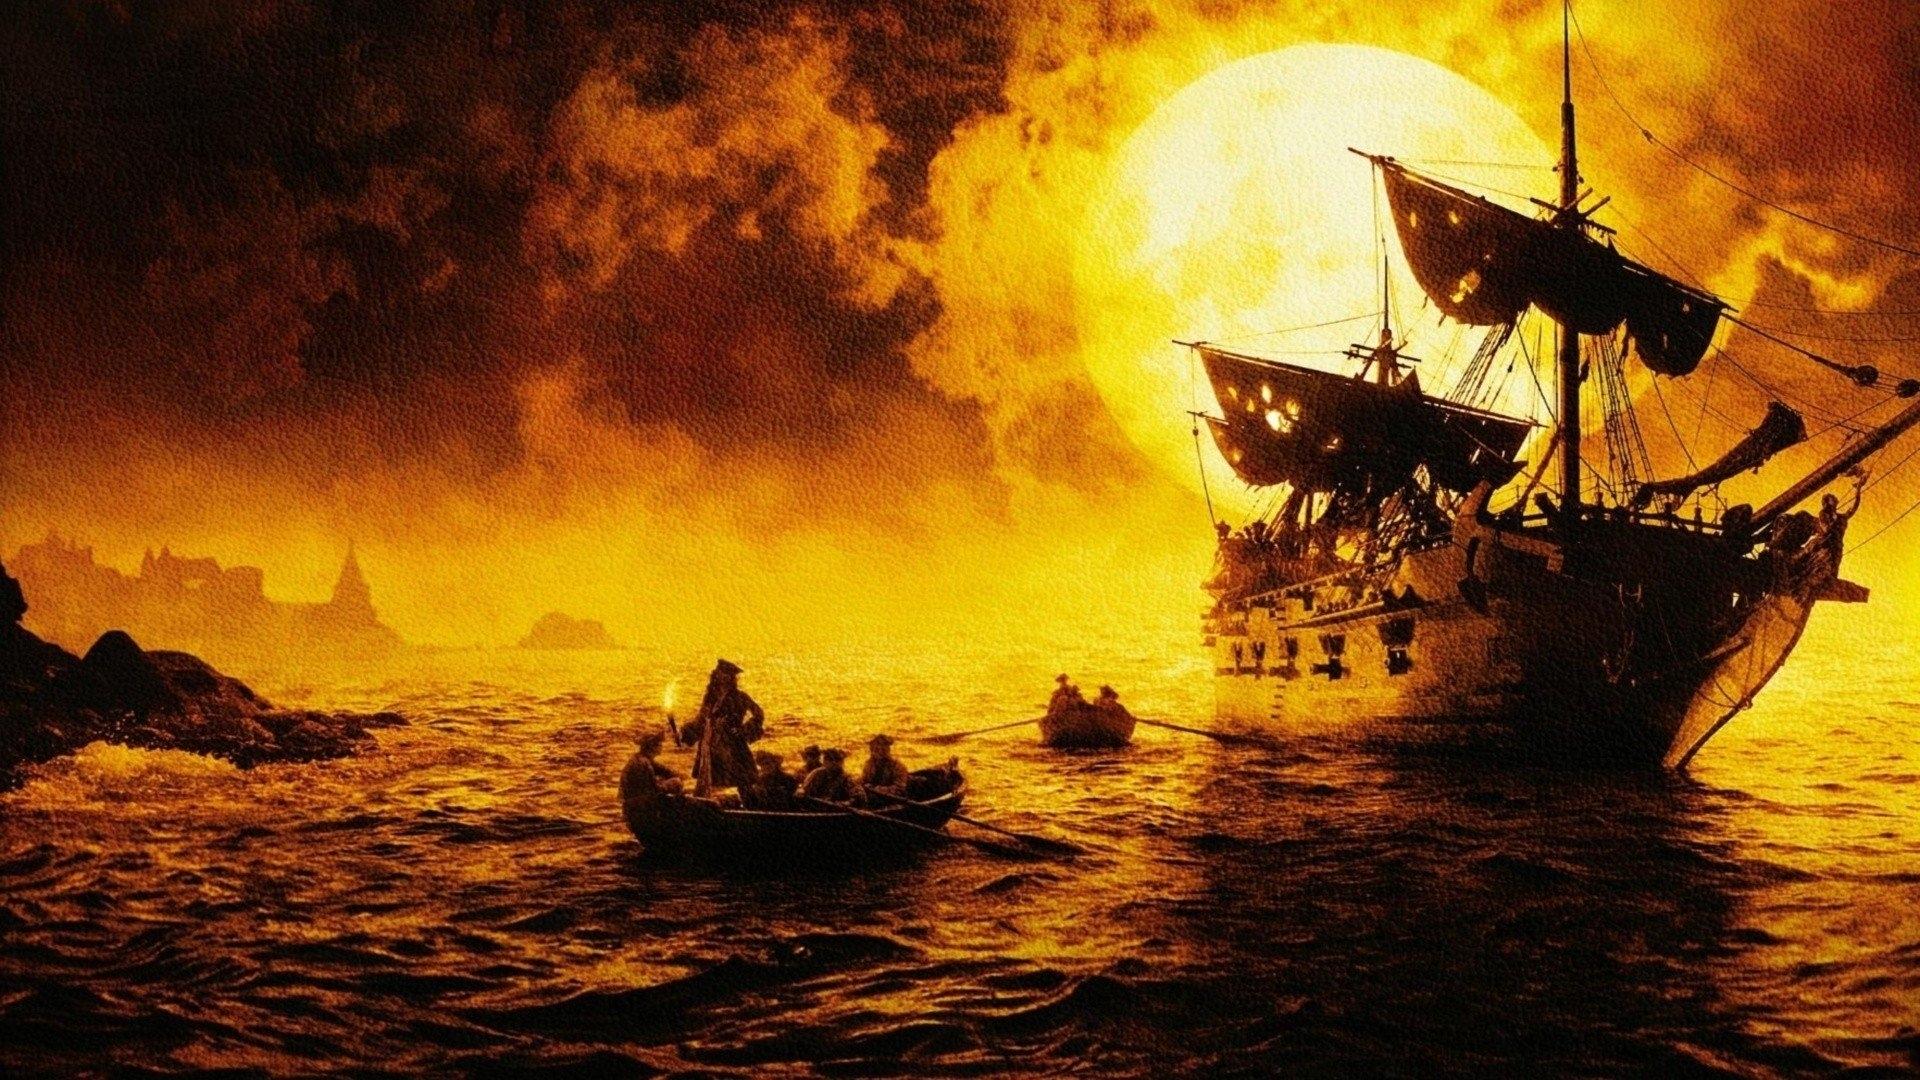 pirates of the caribbean wallpaper hd | pixelstalk